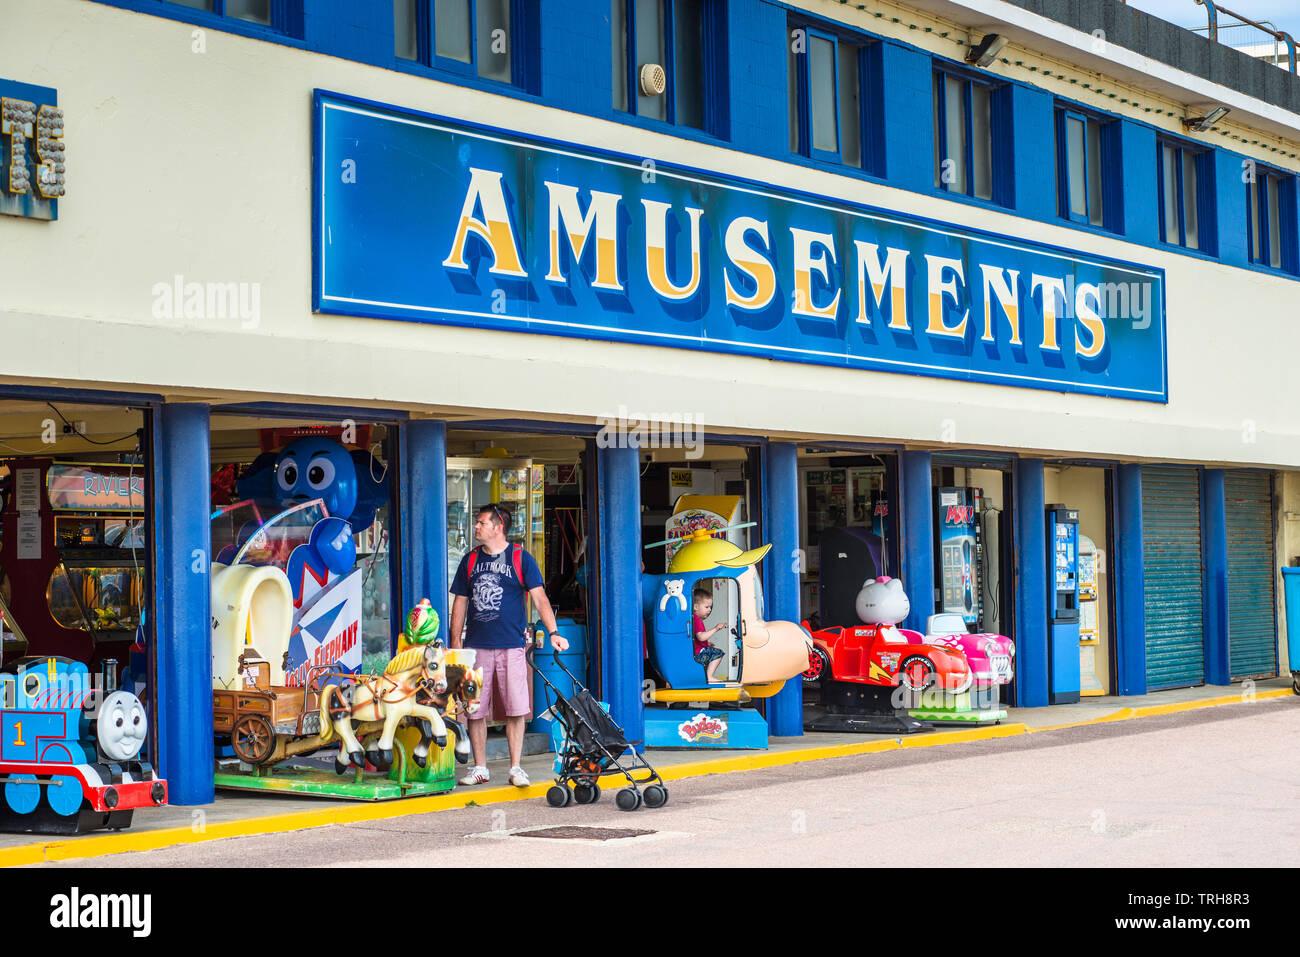 Amusements arcade on Bournemouth seafront in Dorset, England, UK. - Stock Image